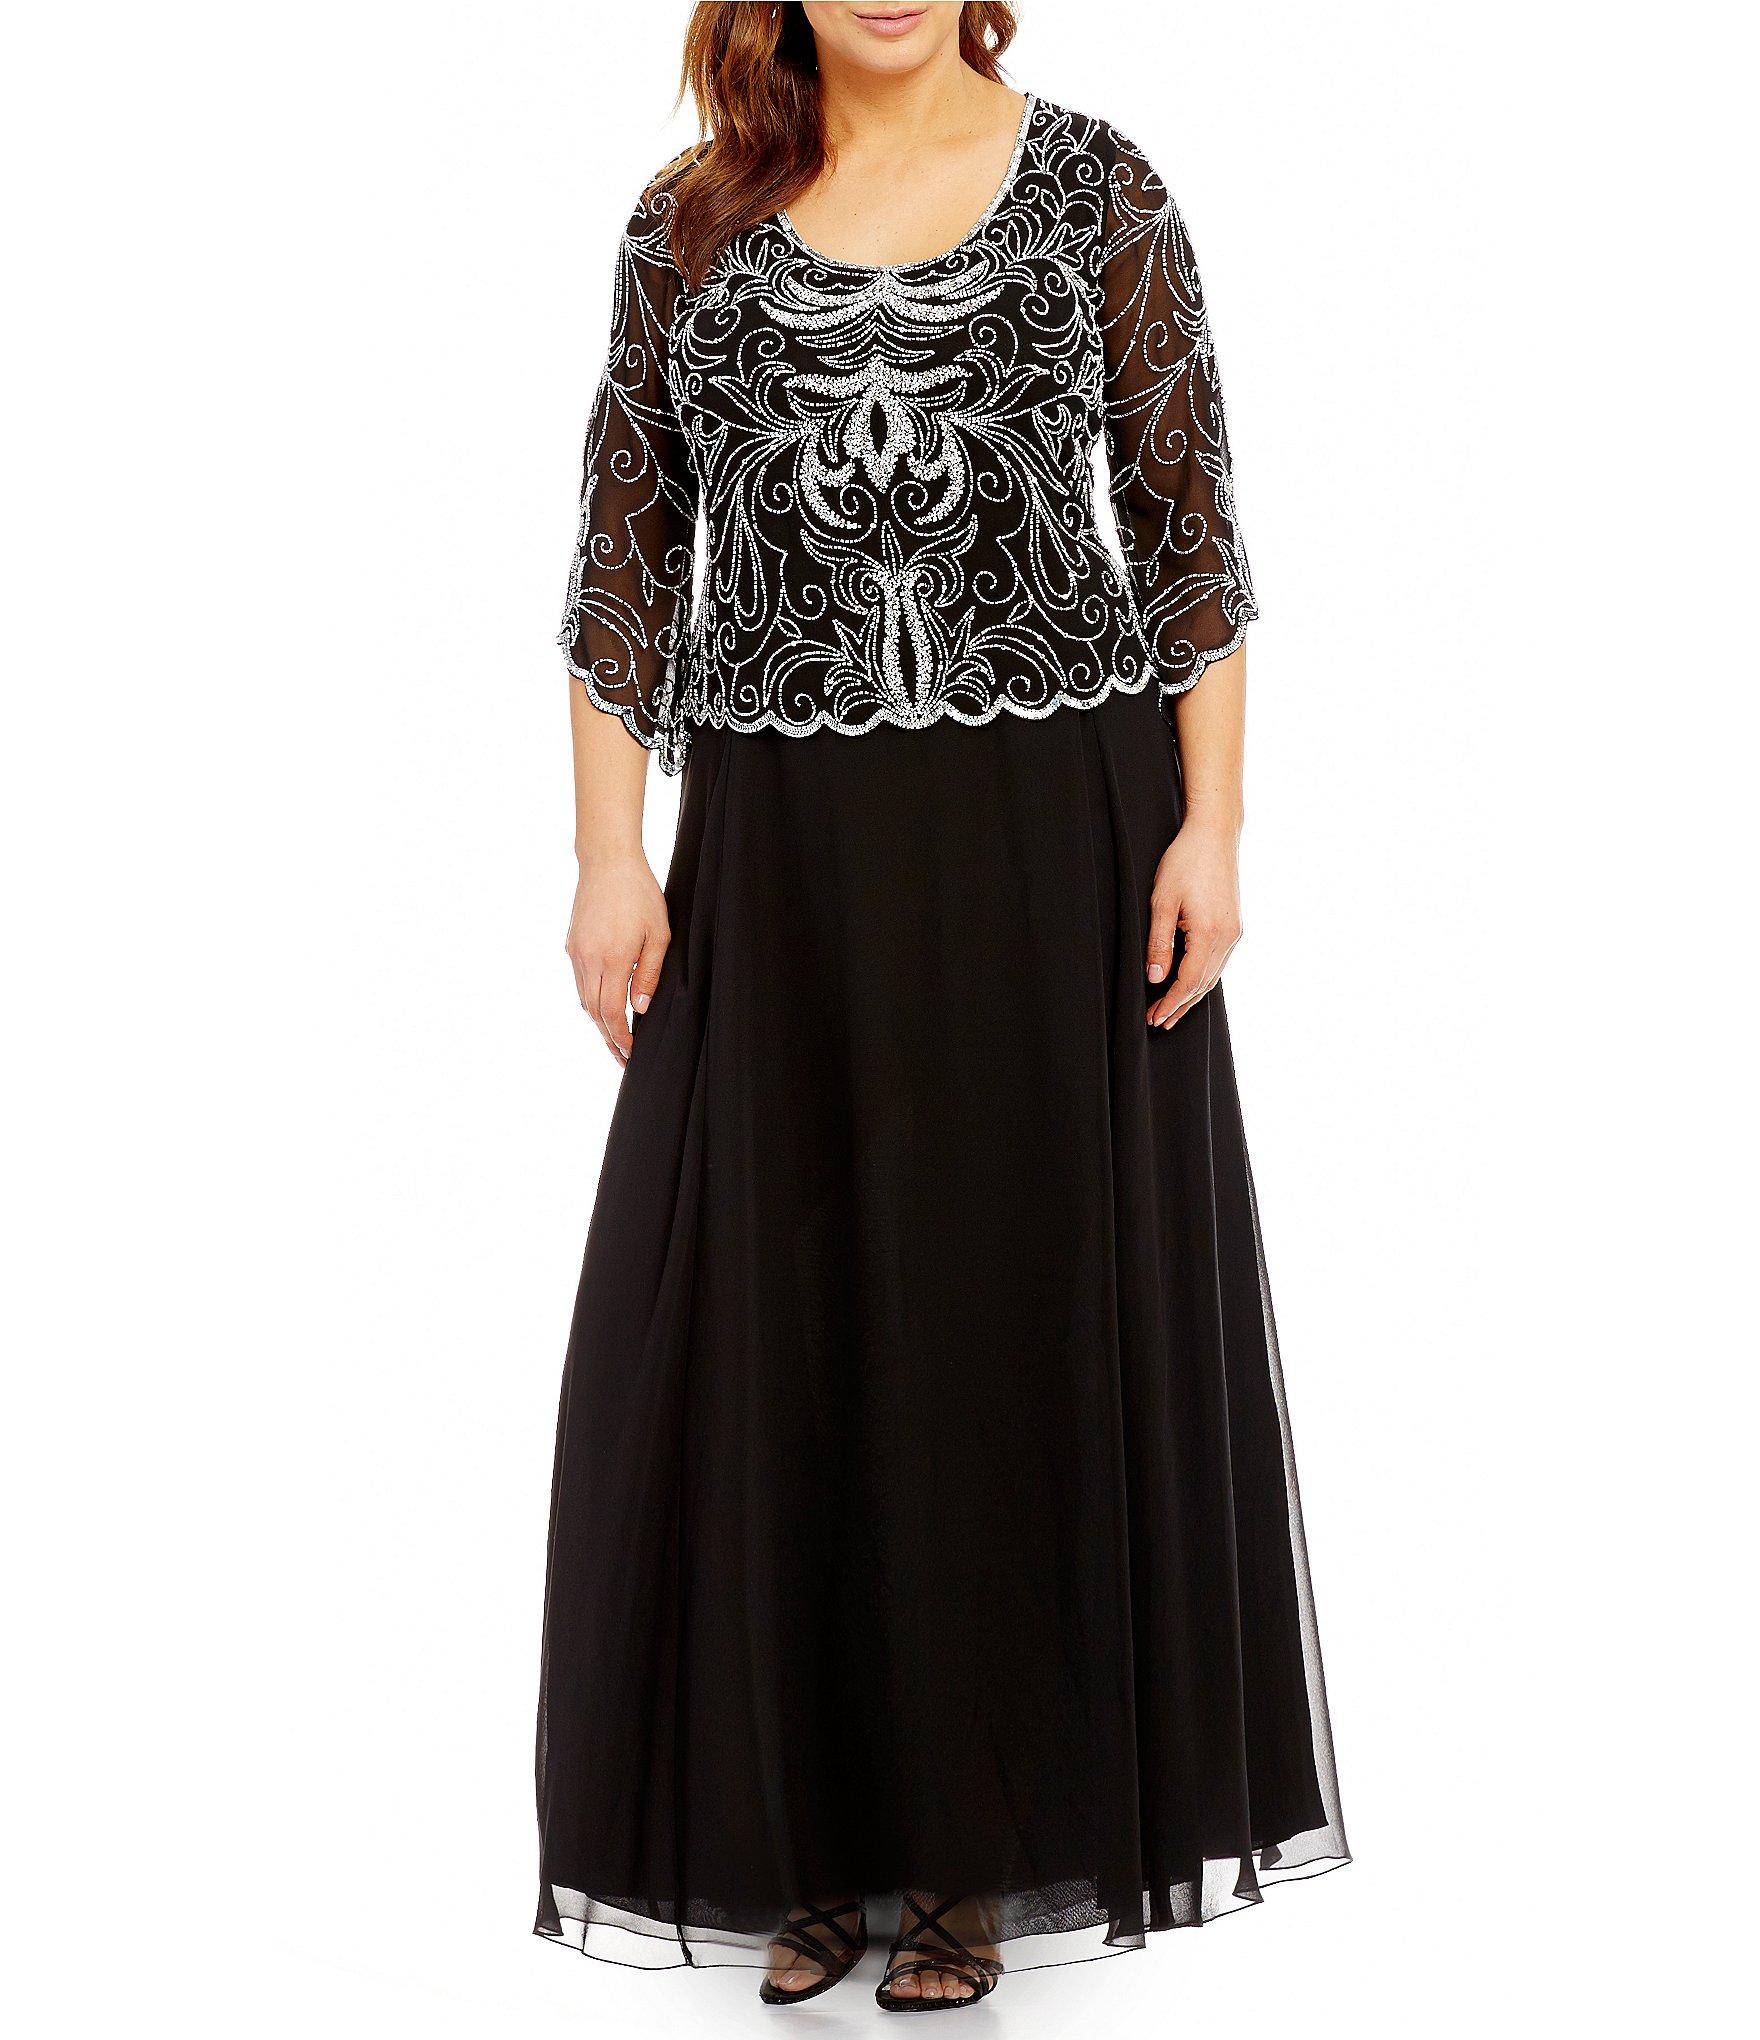 Black dress 6x alabama